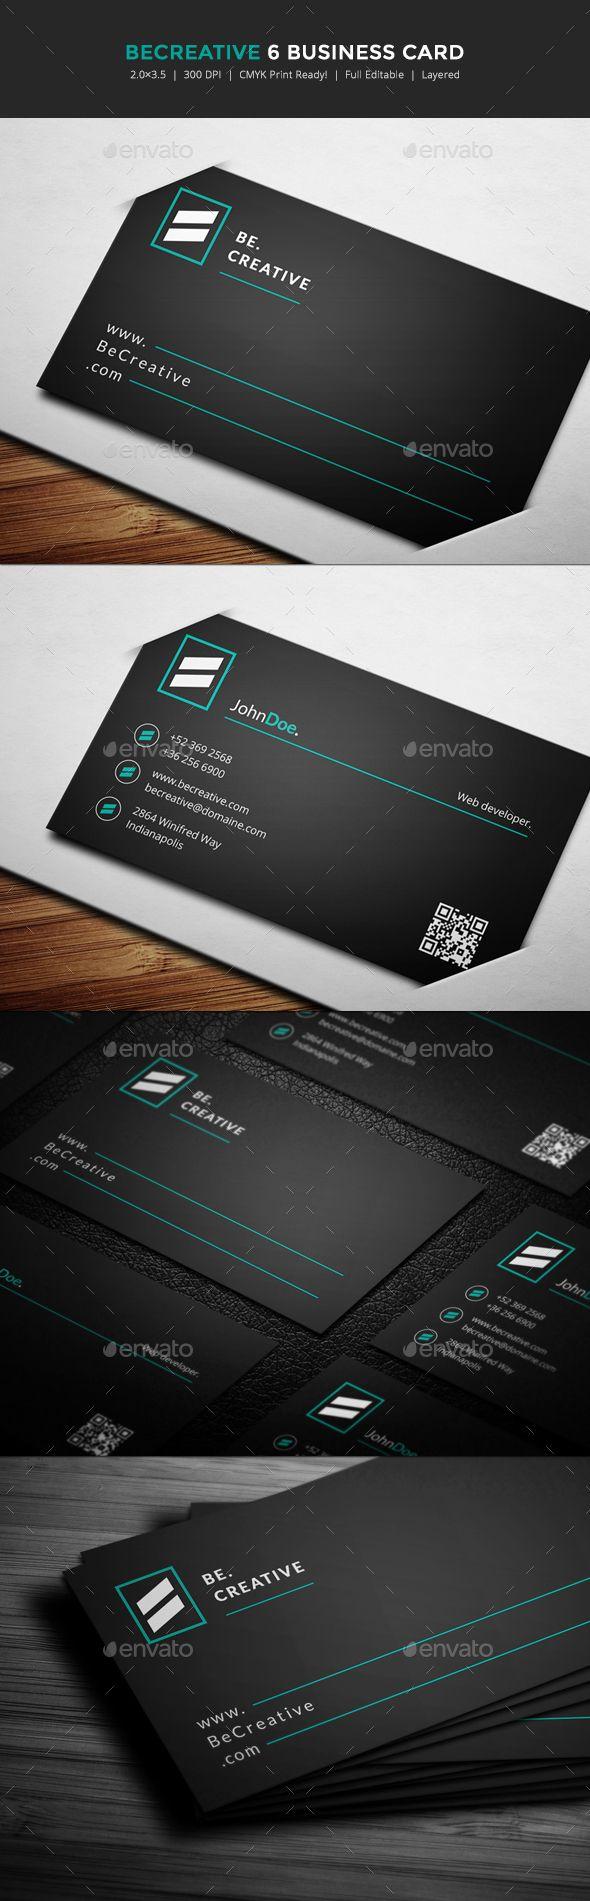 Becreative 6 business card reheart Choice Image